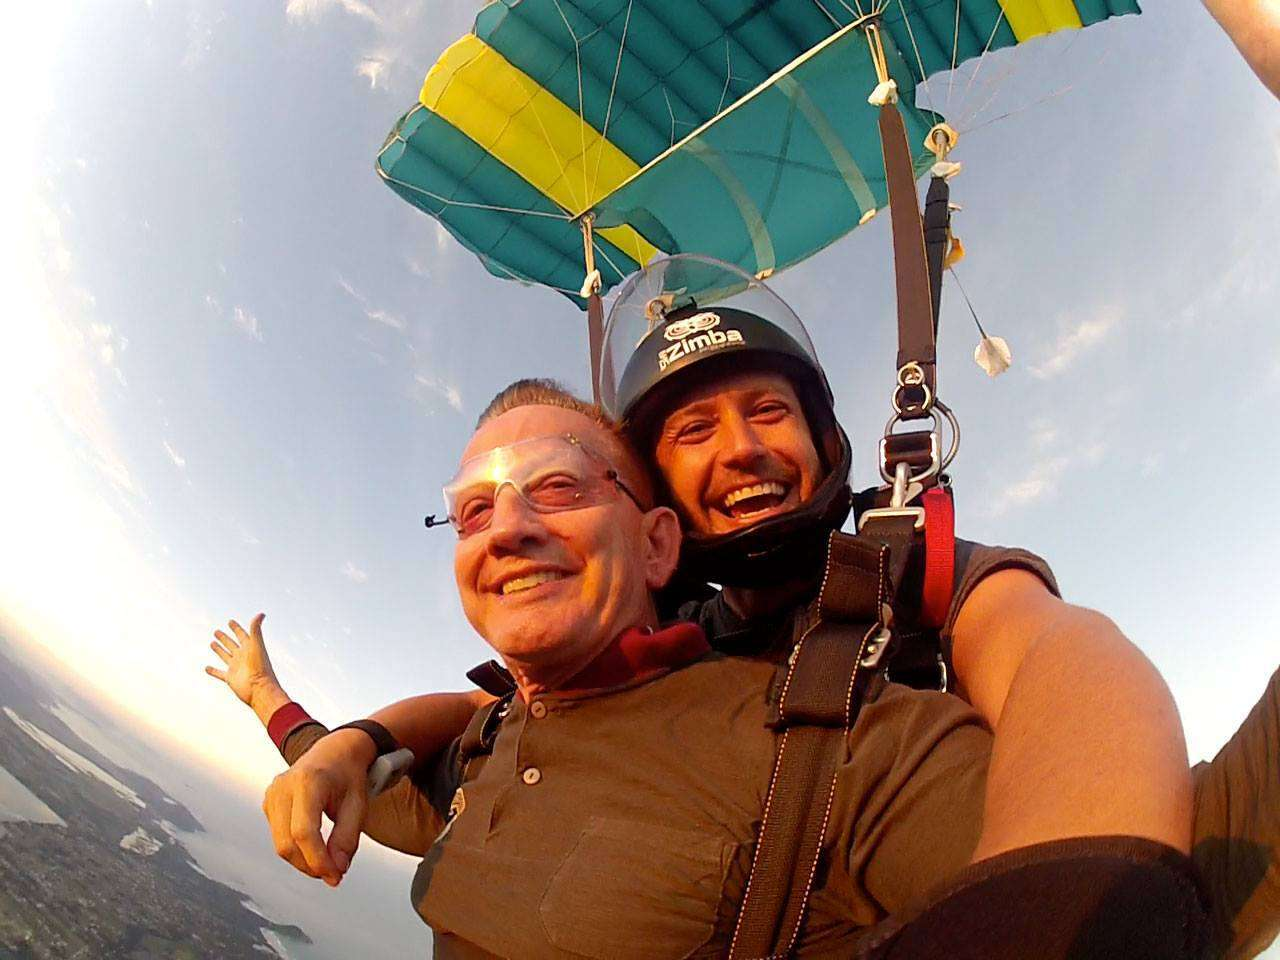 Pai de atleta salta de paraquedas aos 68 anos 1